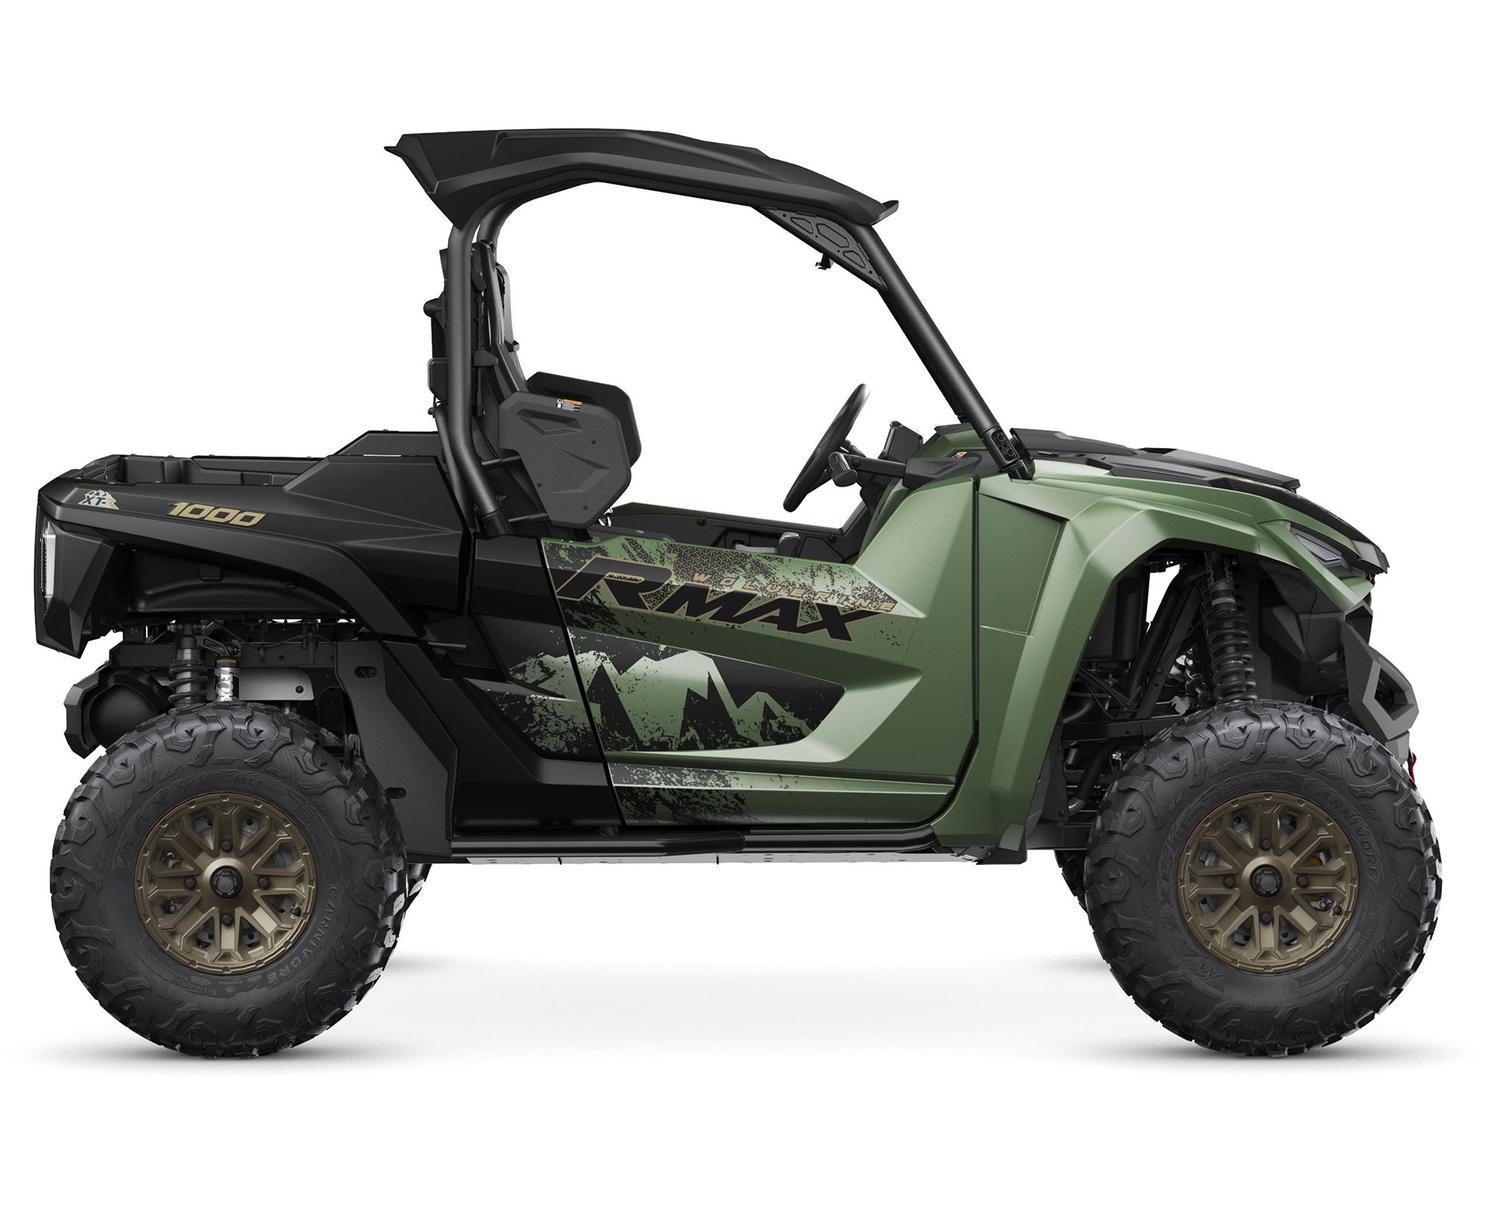 2021 Yamaha Wolverine RMAX2 1000 EPS SE Covert Green